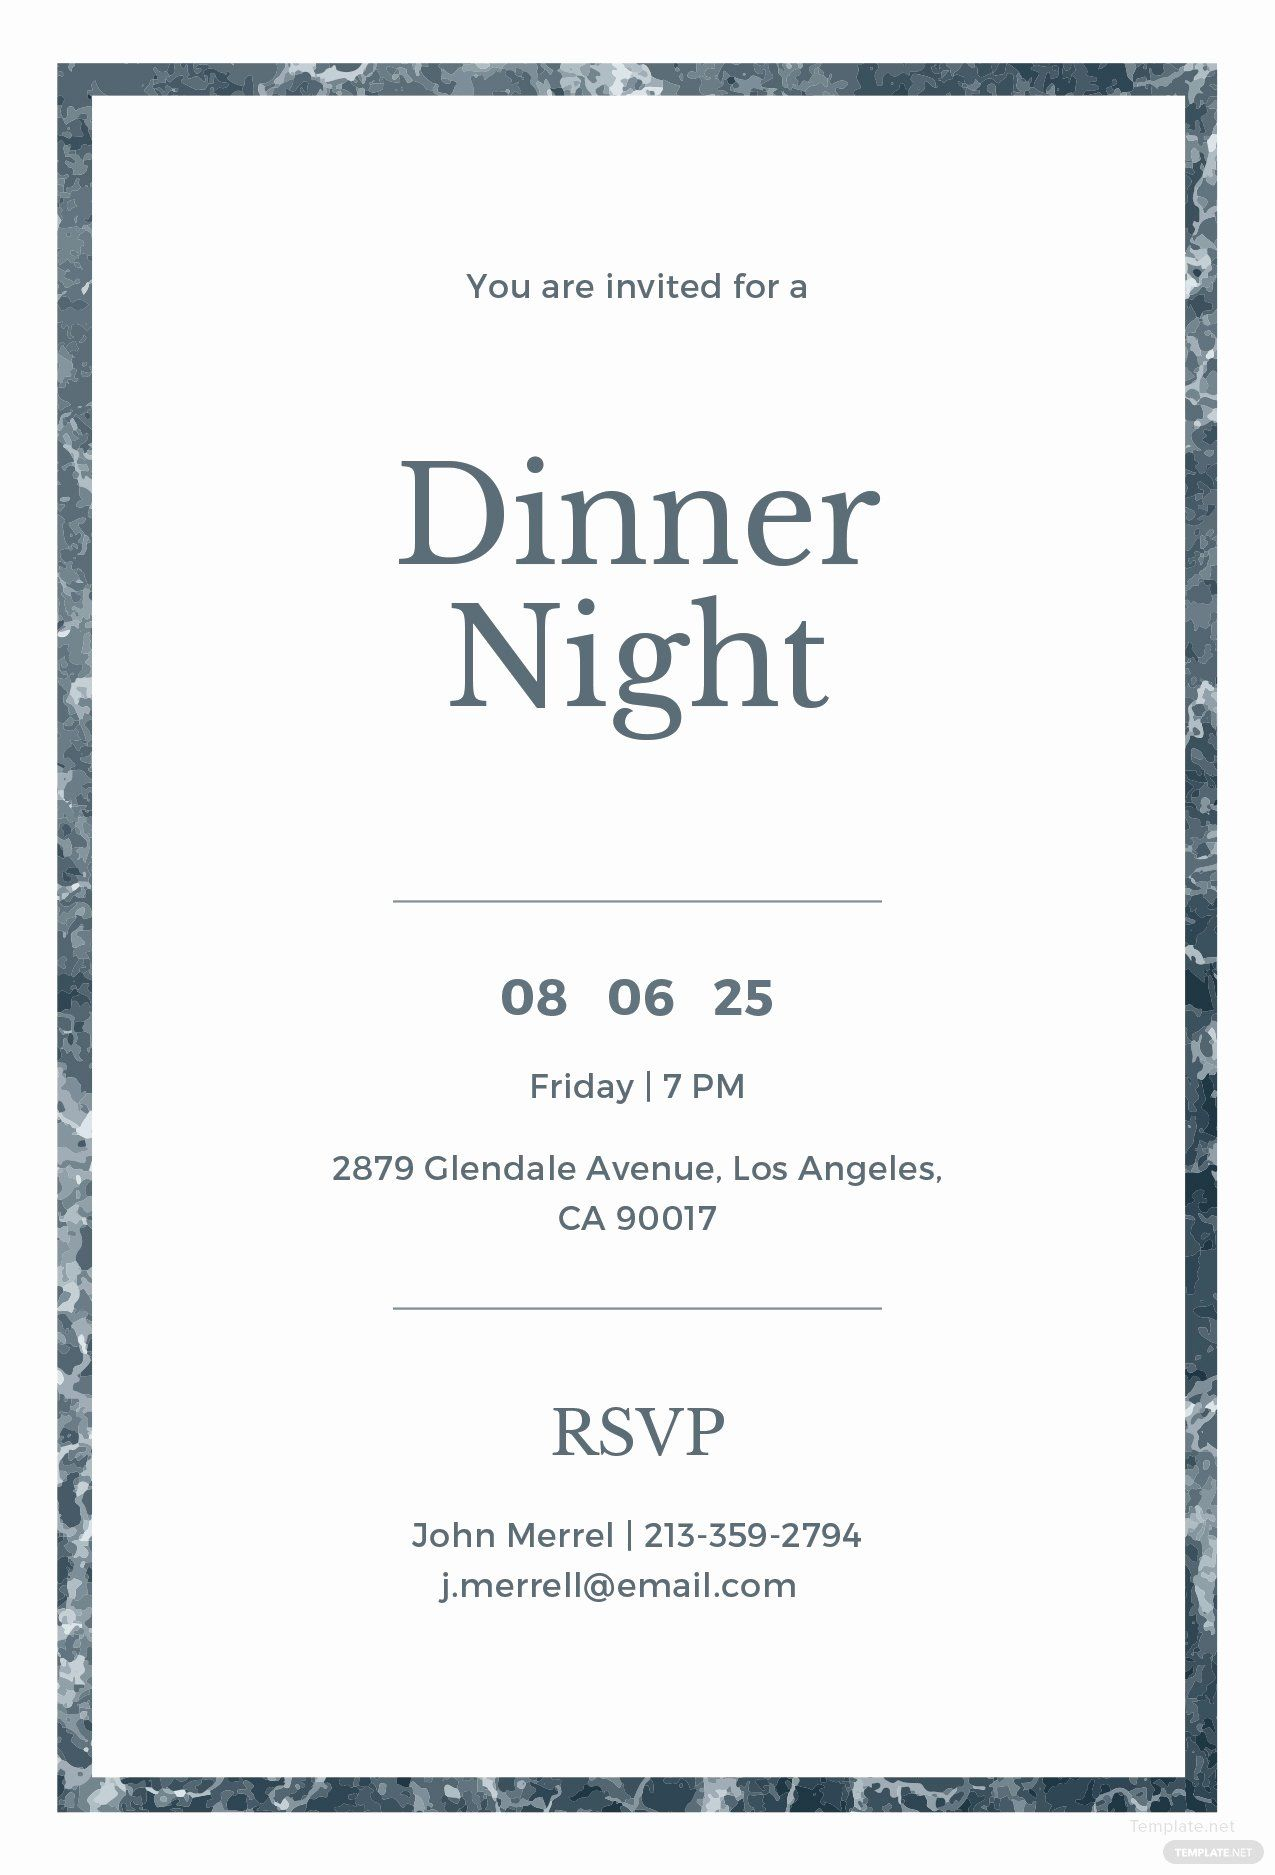 Dinner Party Invite Template Best Of Free Sample Dinner Invitation